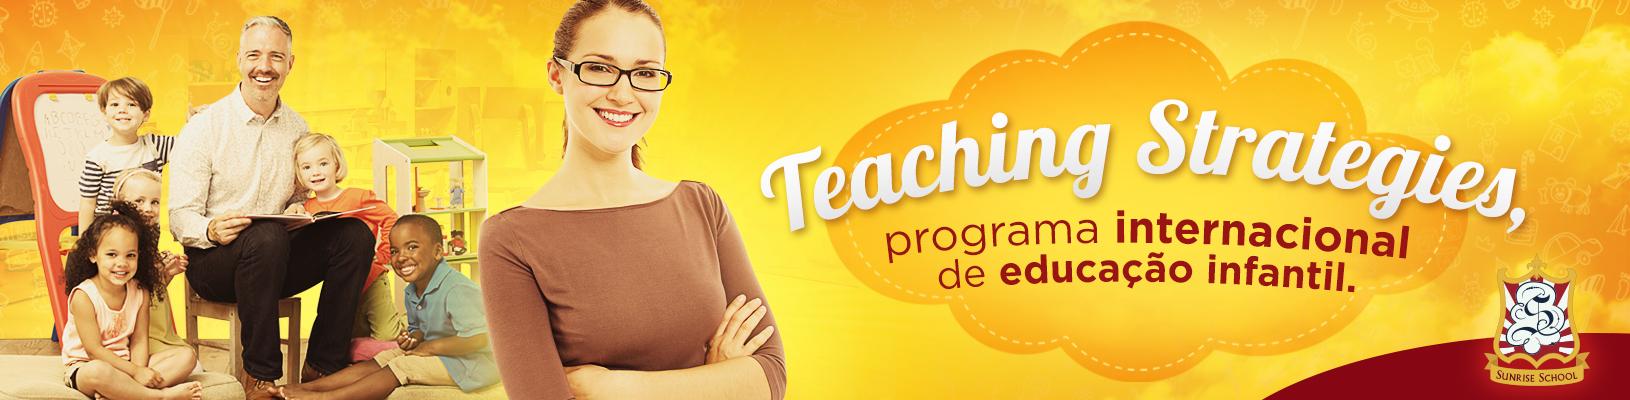 Sunrise School e Teaching Strategies - Educação Infantil Bílingue em Osasco - Sunrise School